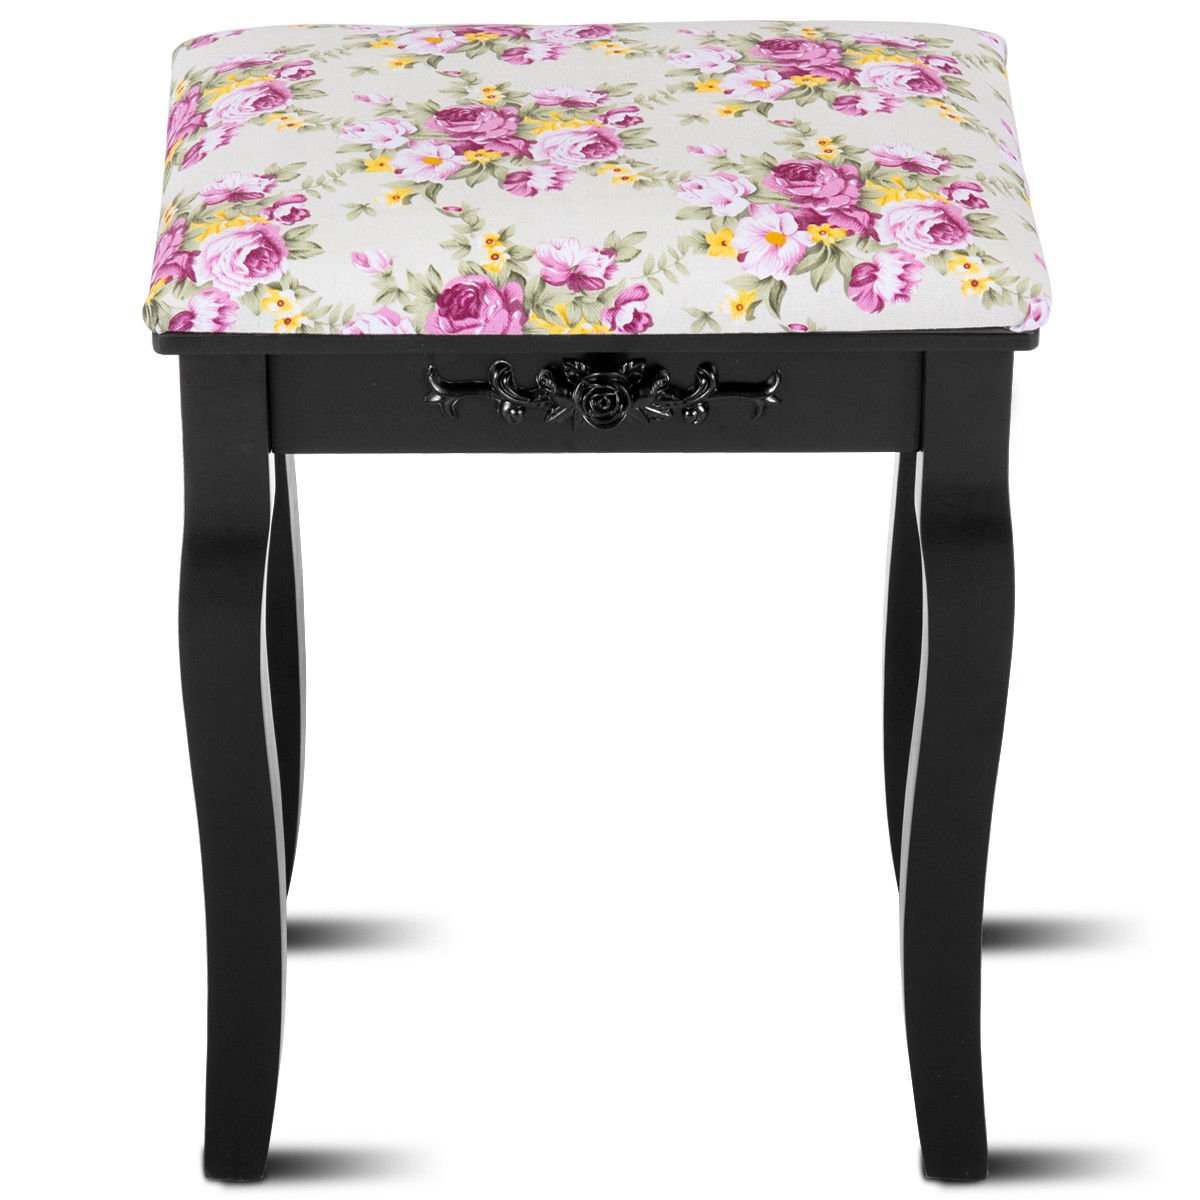 Globe House Products GHP 250-Lbs Capacity Black Pine Wood & MDF Panel Padded Cushion Dressing Stool